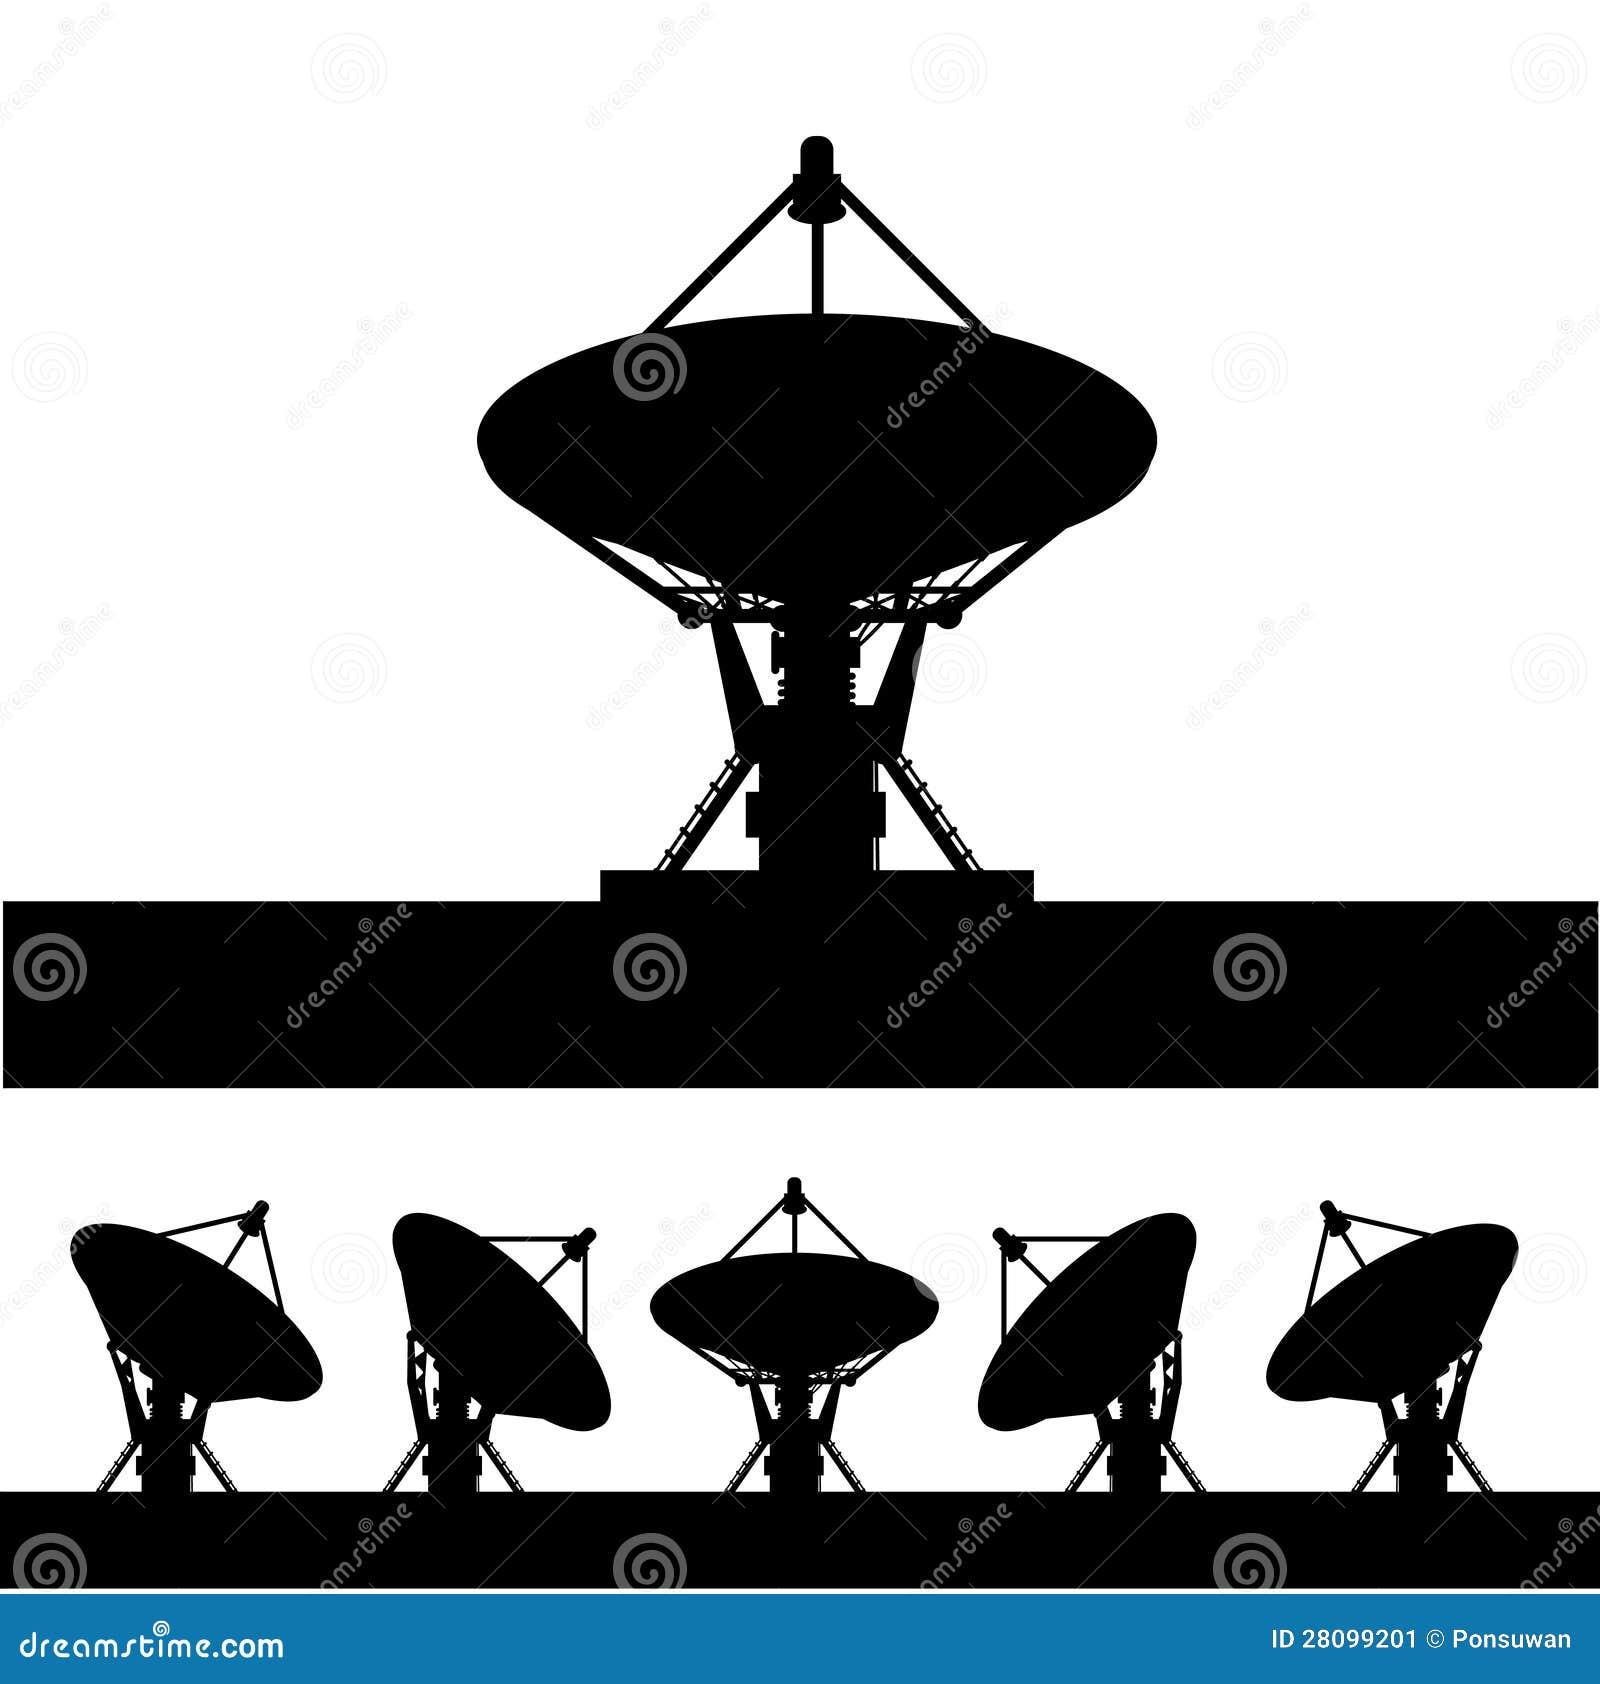 Siluetee la antena parabólica